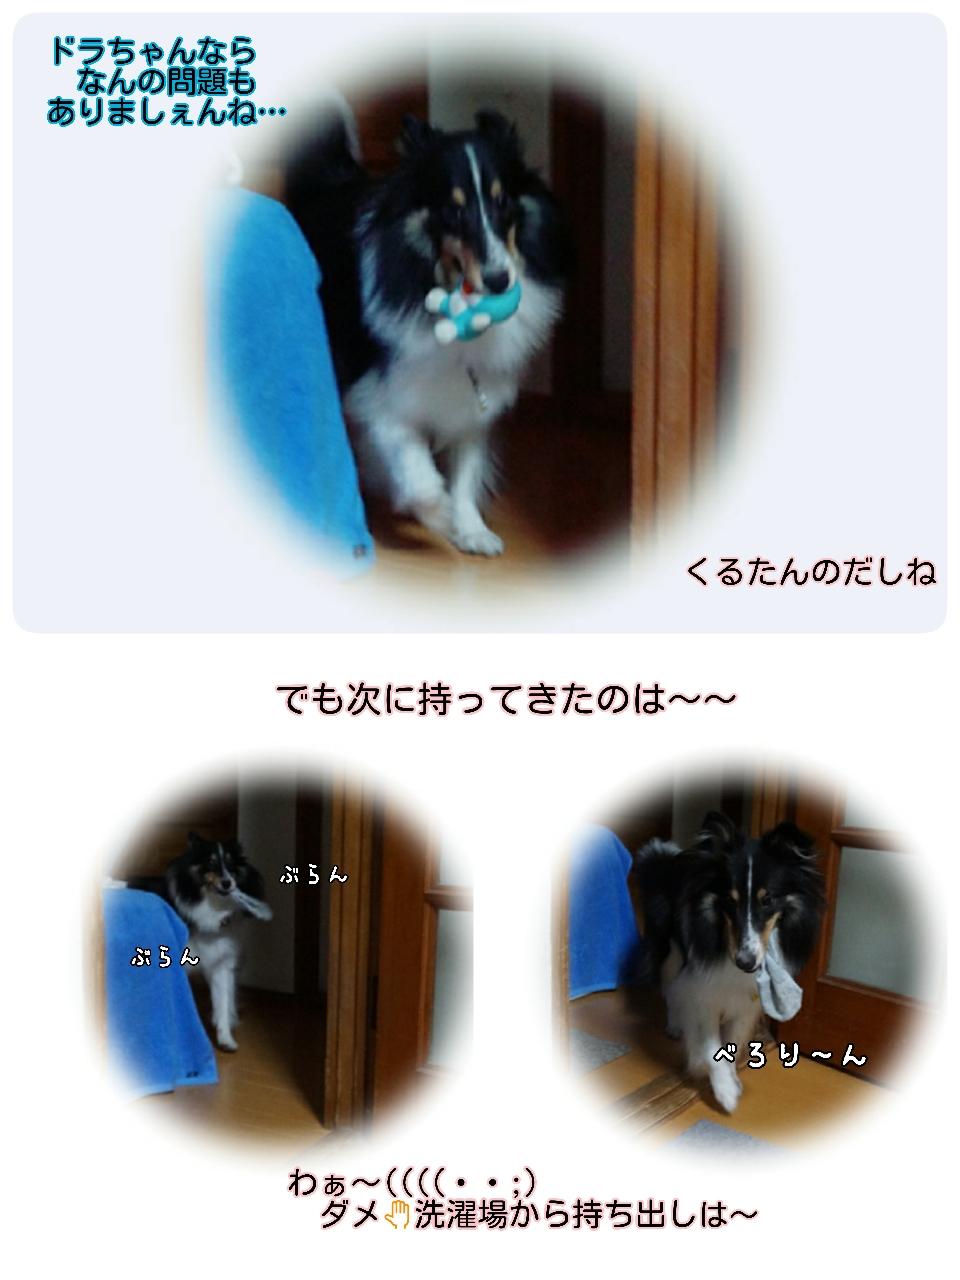 16-09-20-15-16-51-231_deco.jpg